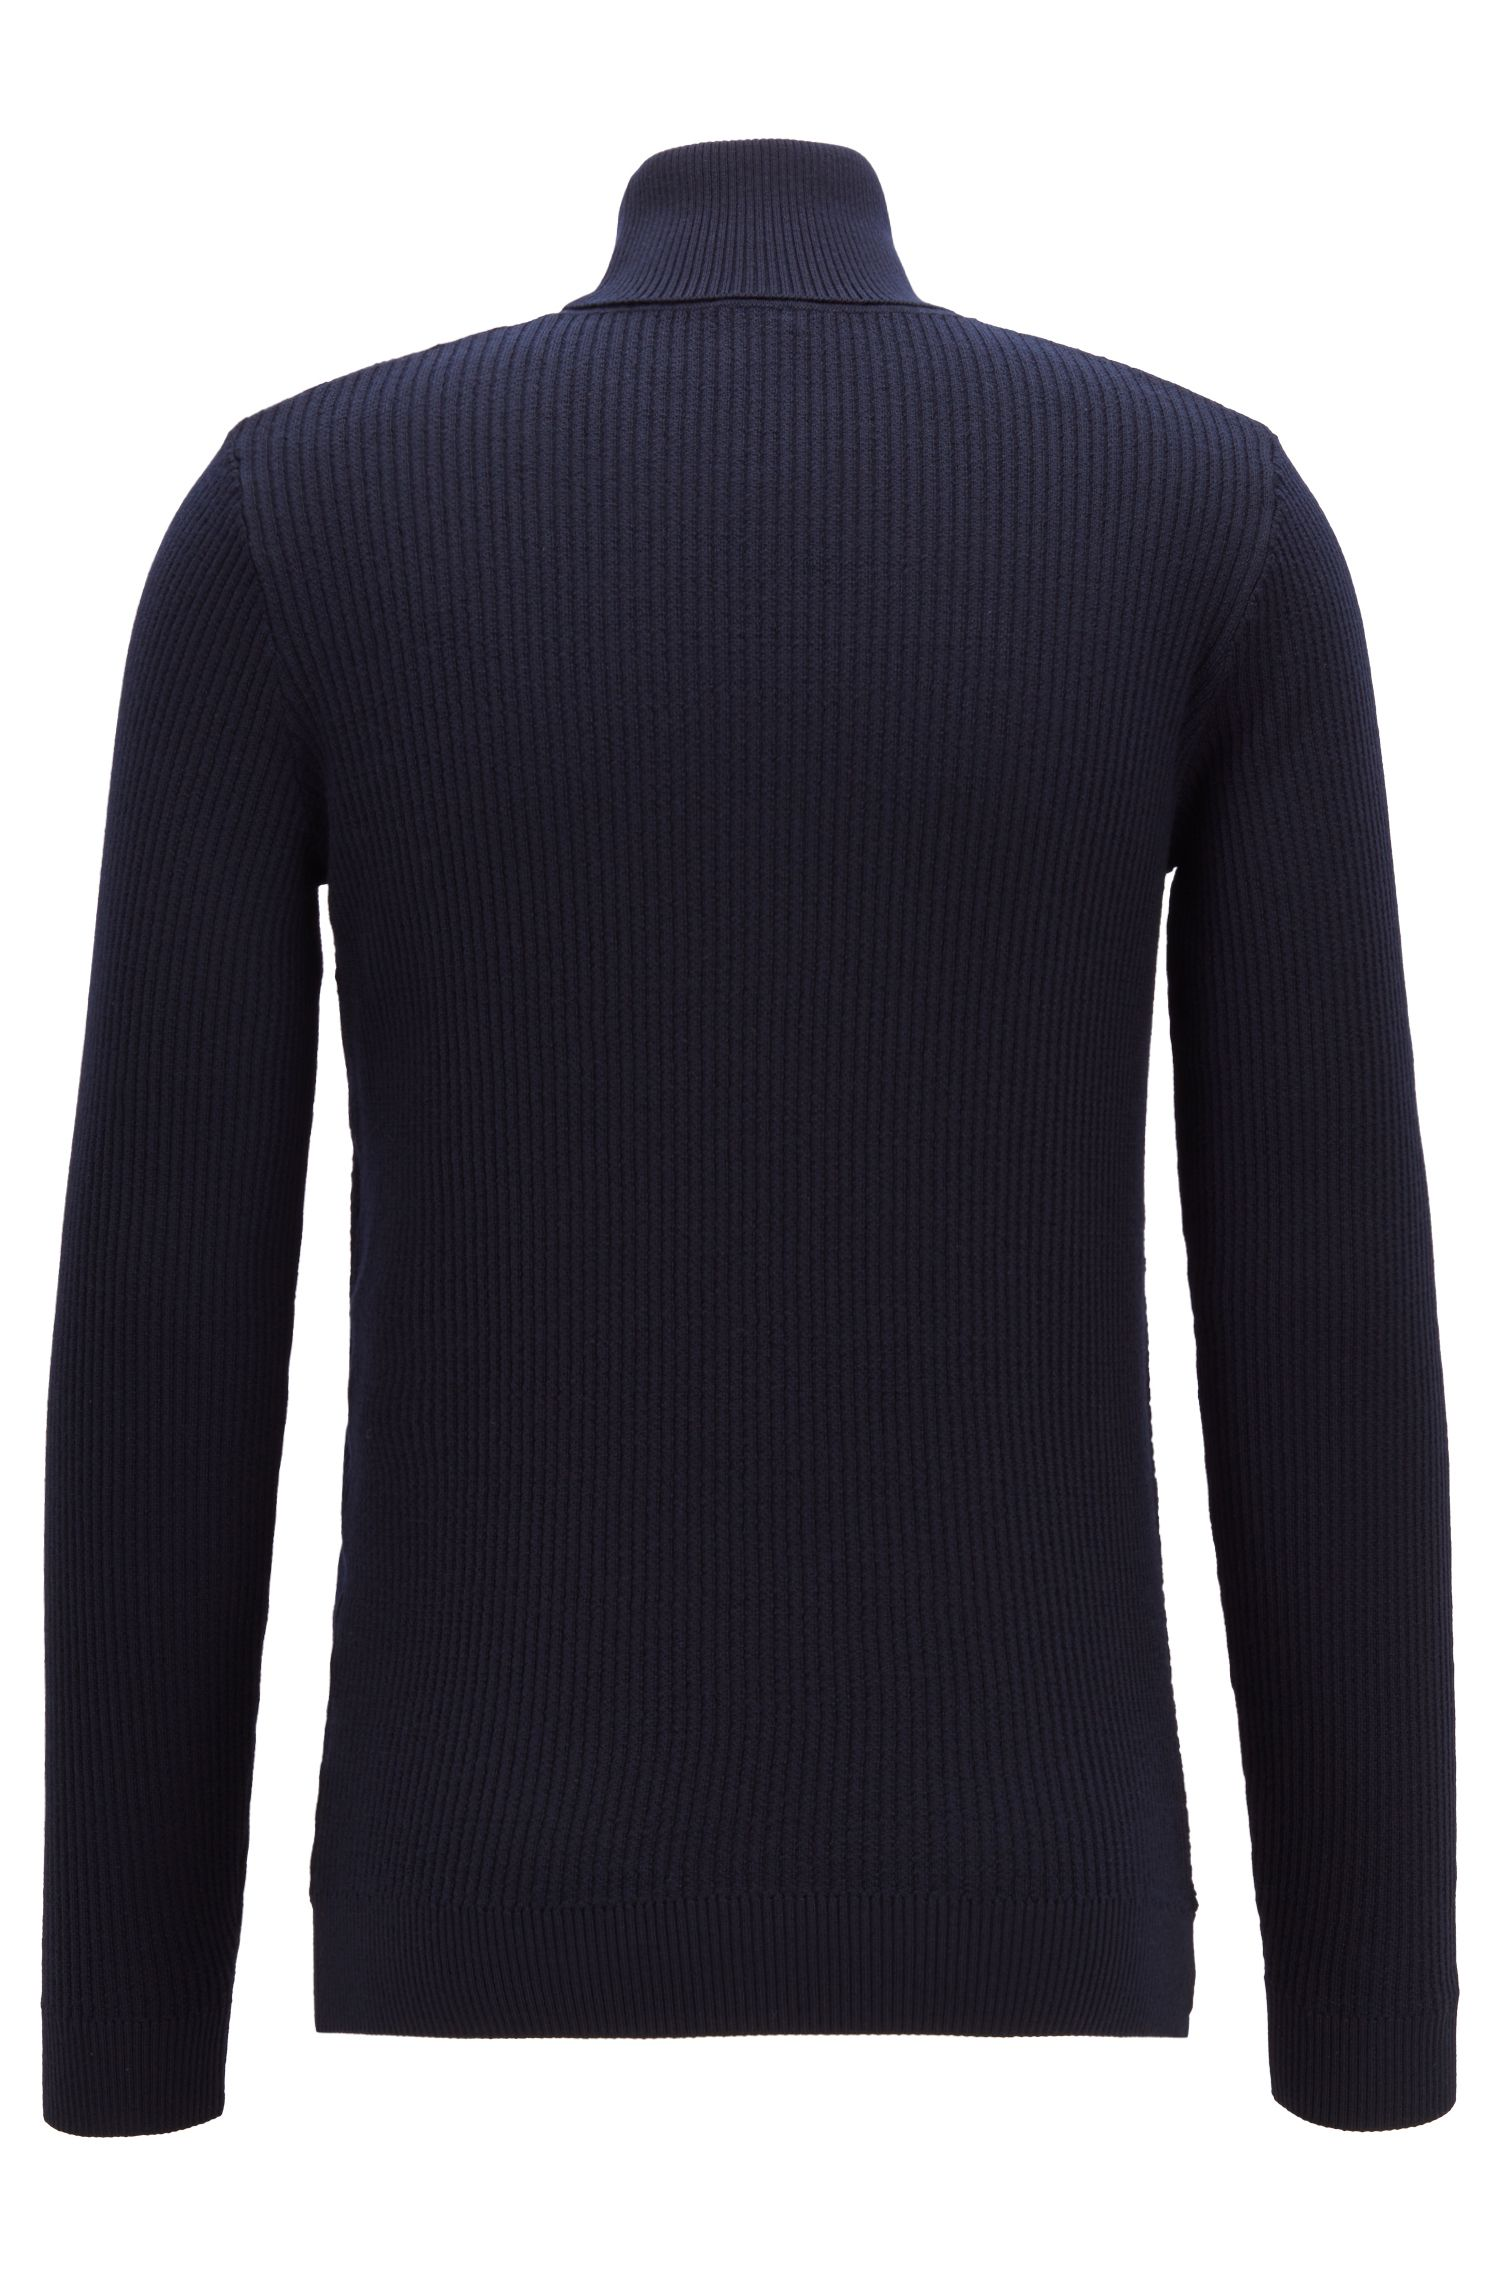 Turtleneck sweater in Italian merino wool with rib patterns, Open Blue